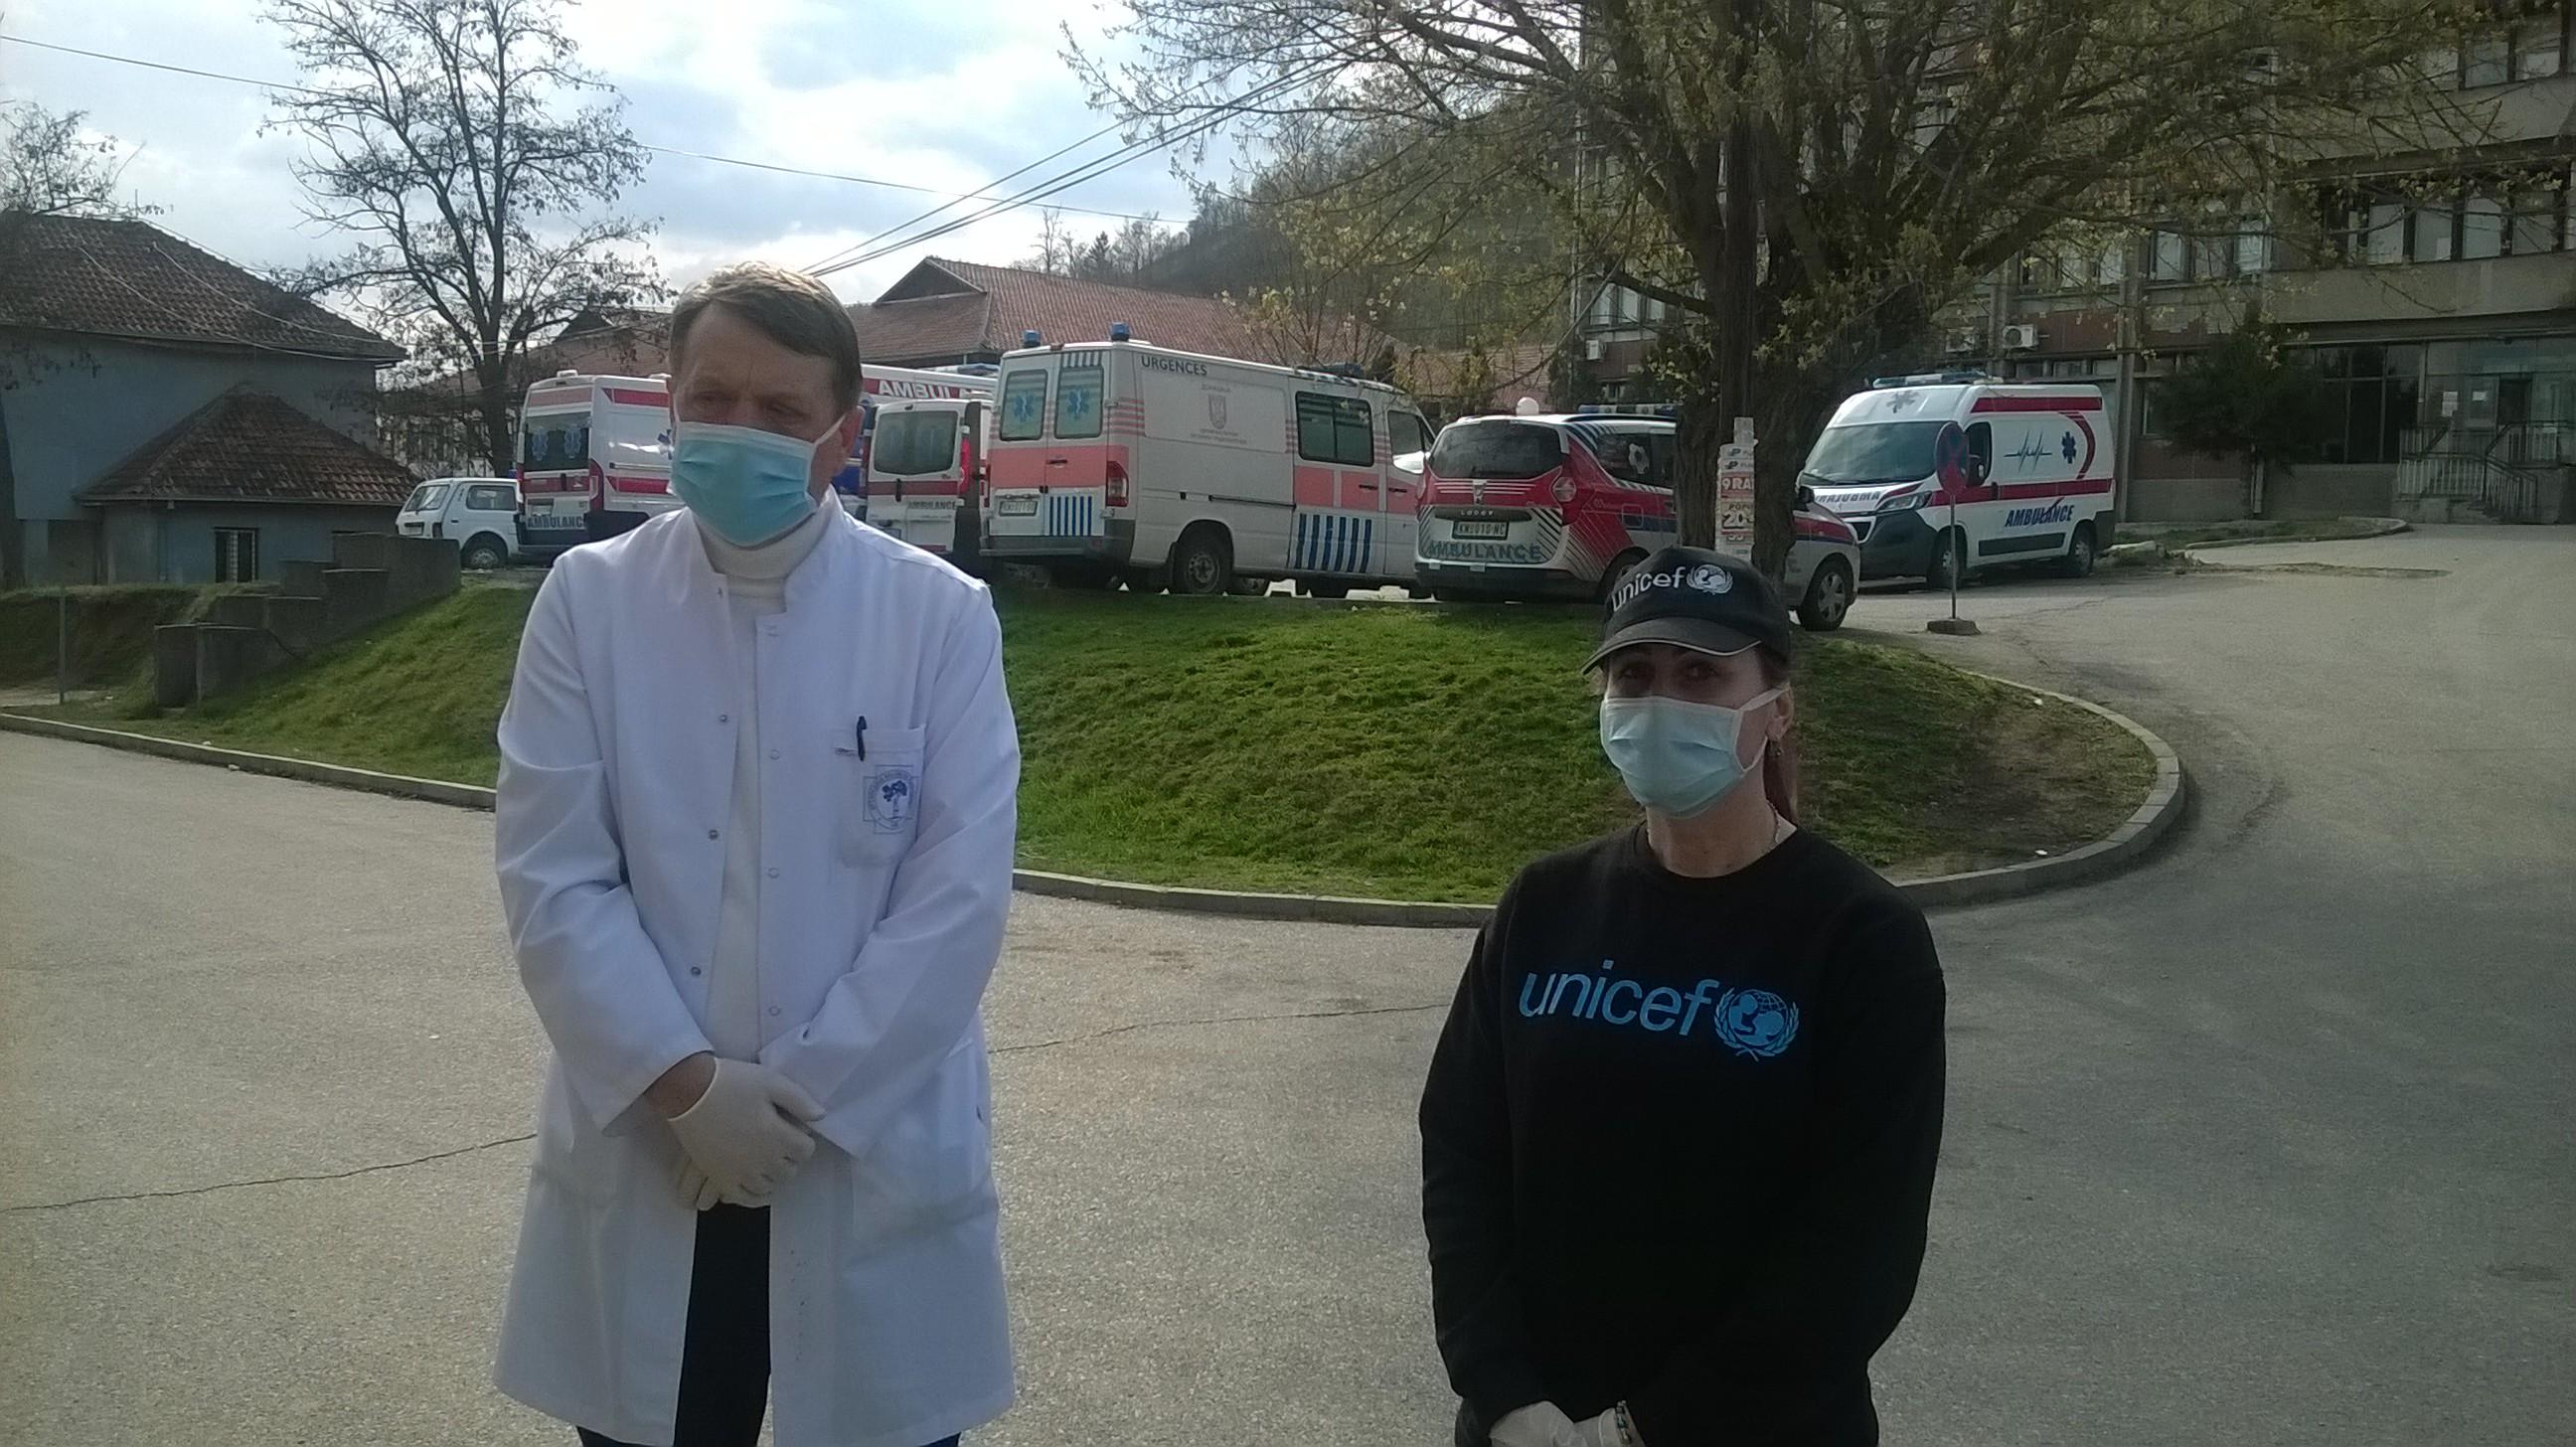 unicef-dodelio-kbc-kosovska-mitrovica-zastitnu-medicinsku-opremu